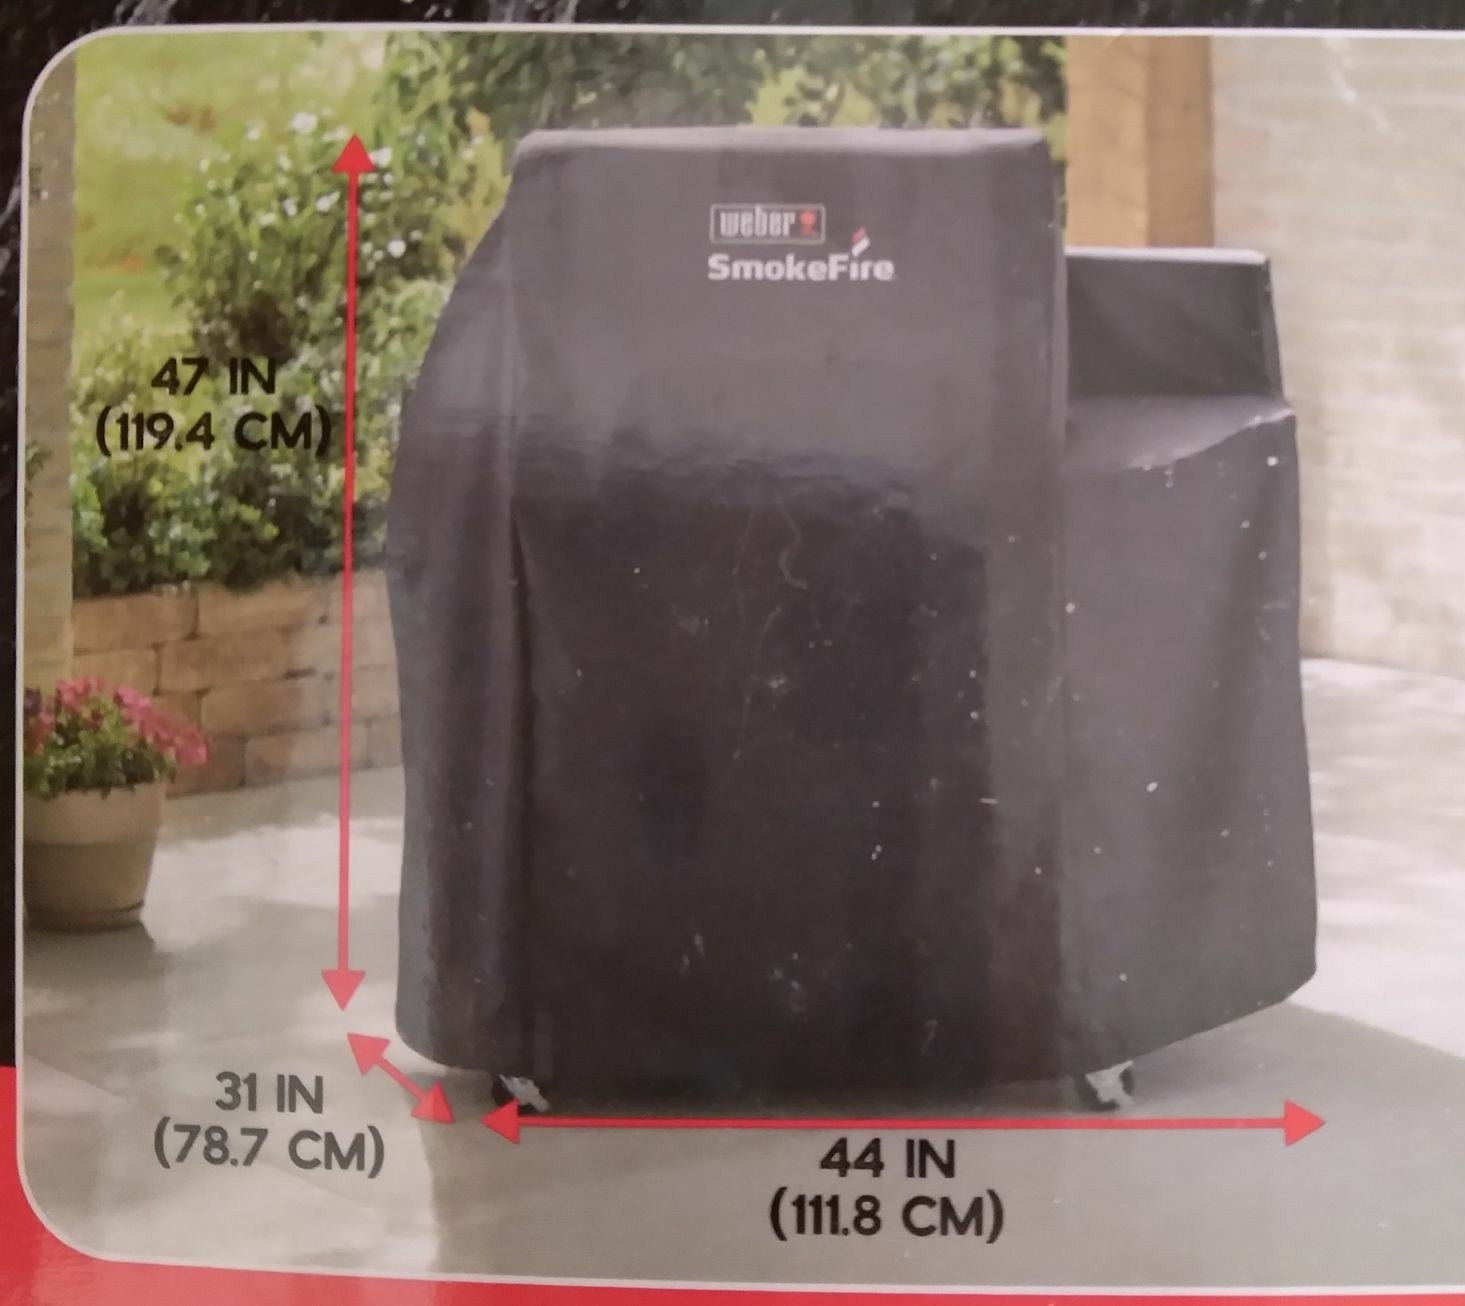 Weber 7190 pellet grill cover